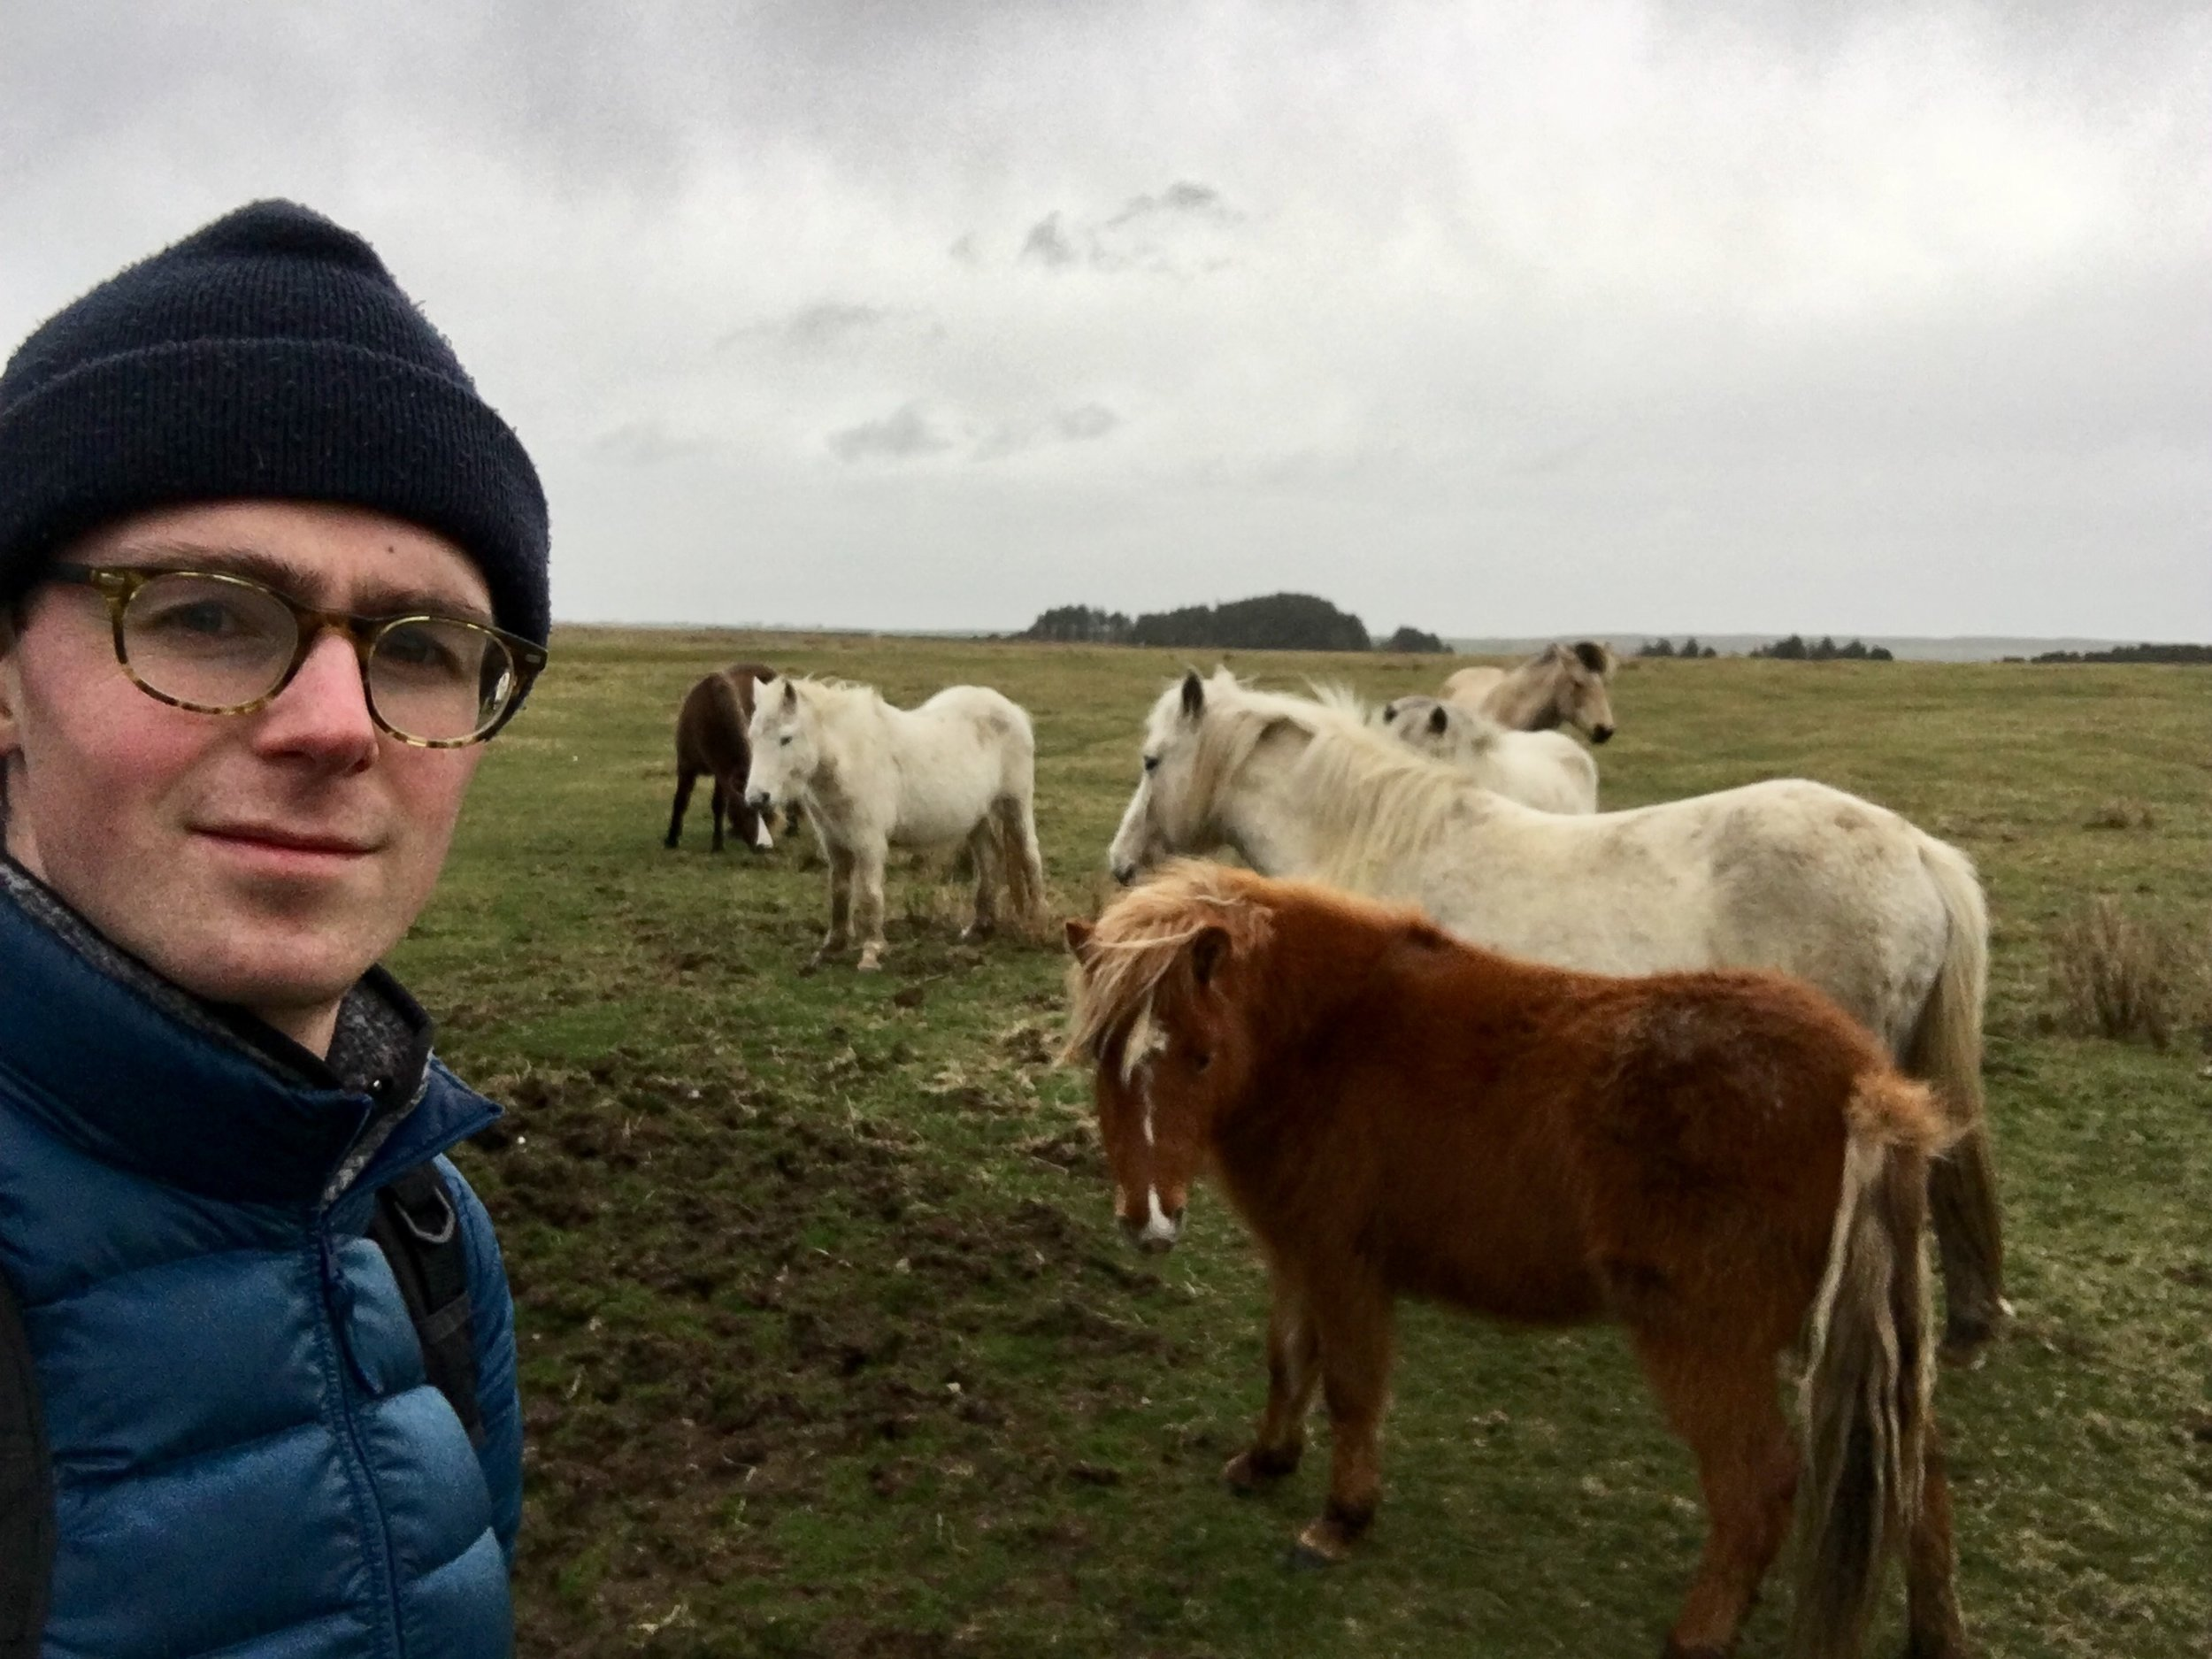 Ponies, Davidstow, March 2019